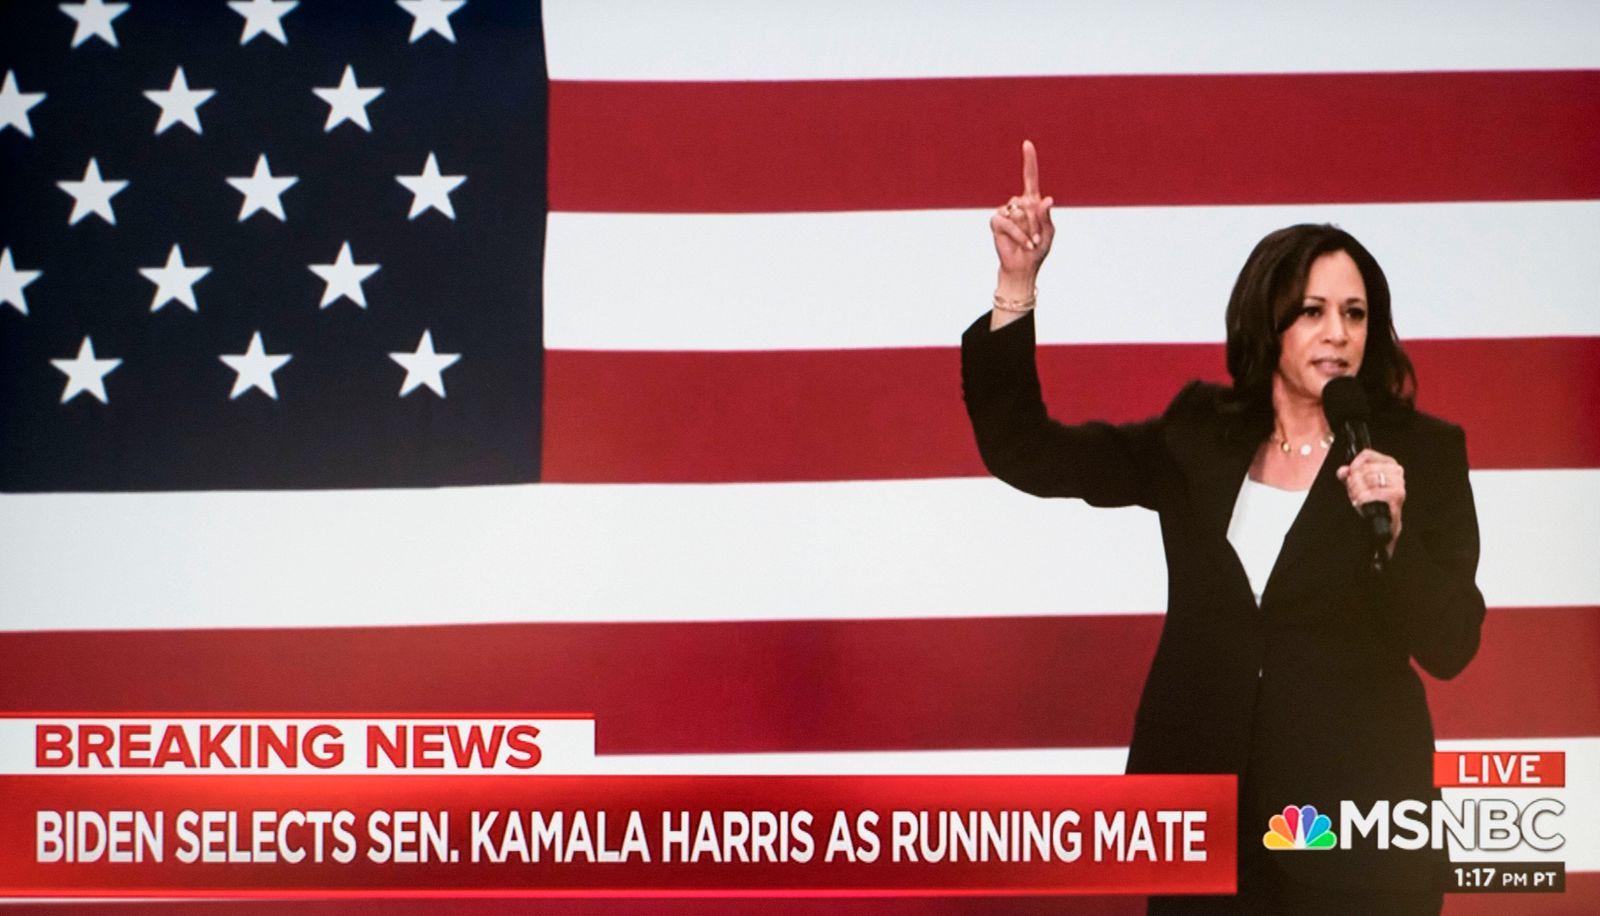 August 11, 2020, Wilmington, Delaware, USA: A screen grab of the news report that JOE BIDEN has announced that Senator